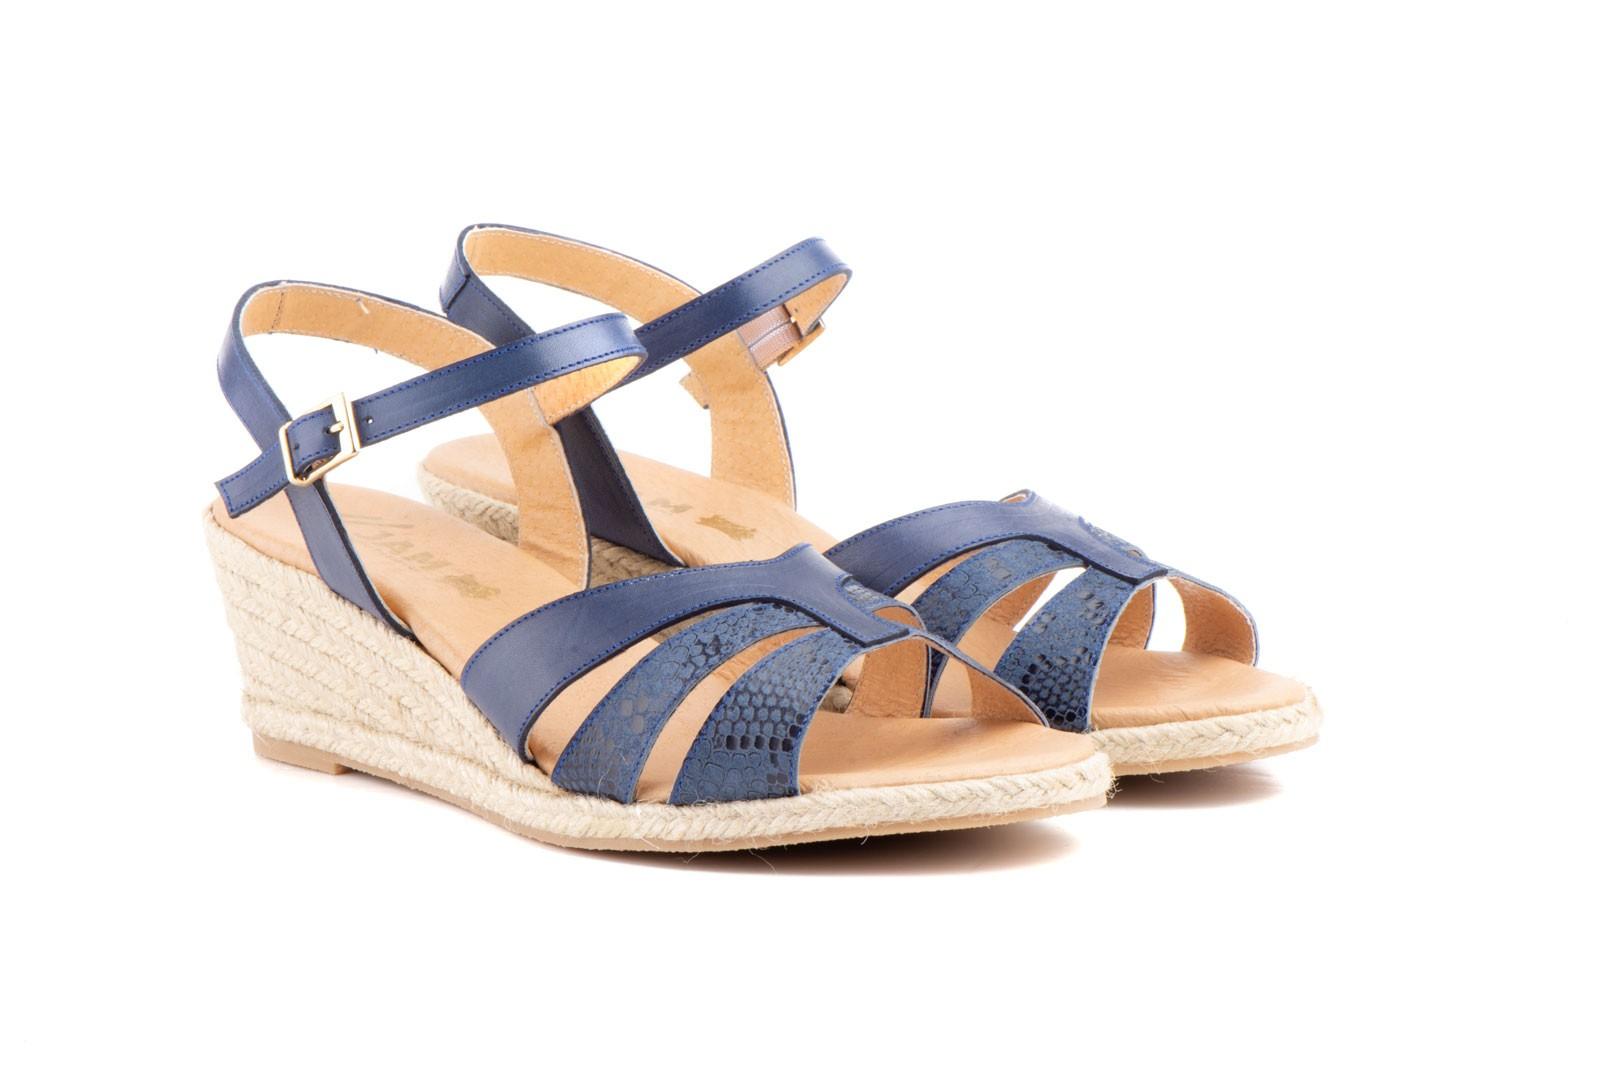 0f6dd4b15d5 Womens sandals navy leather wedge jute plus size jam zancadas xxl jpg  1600x1067 Navy blue womens